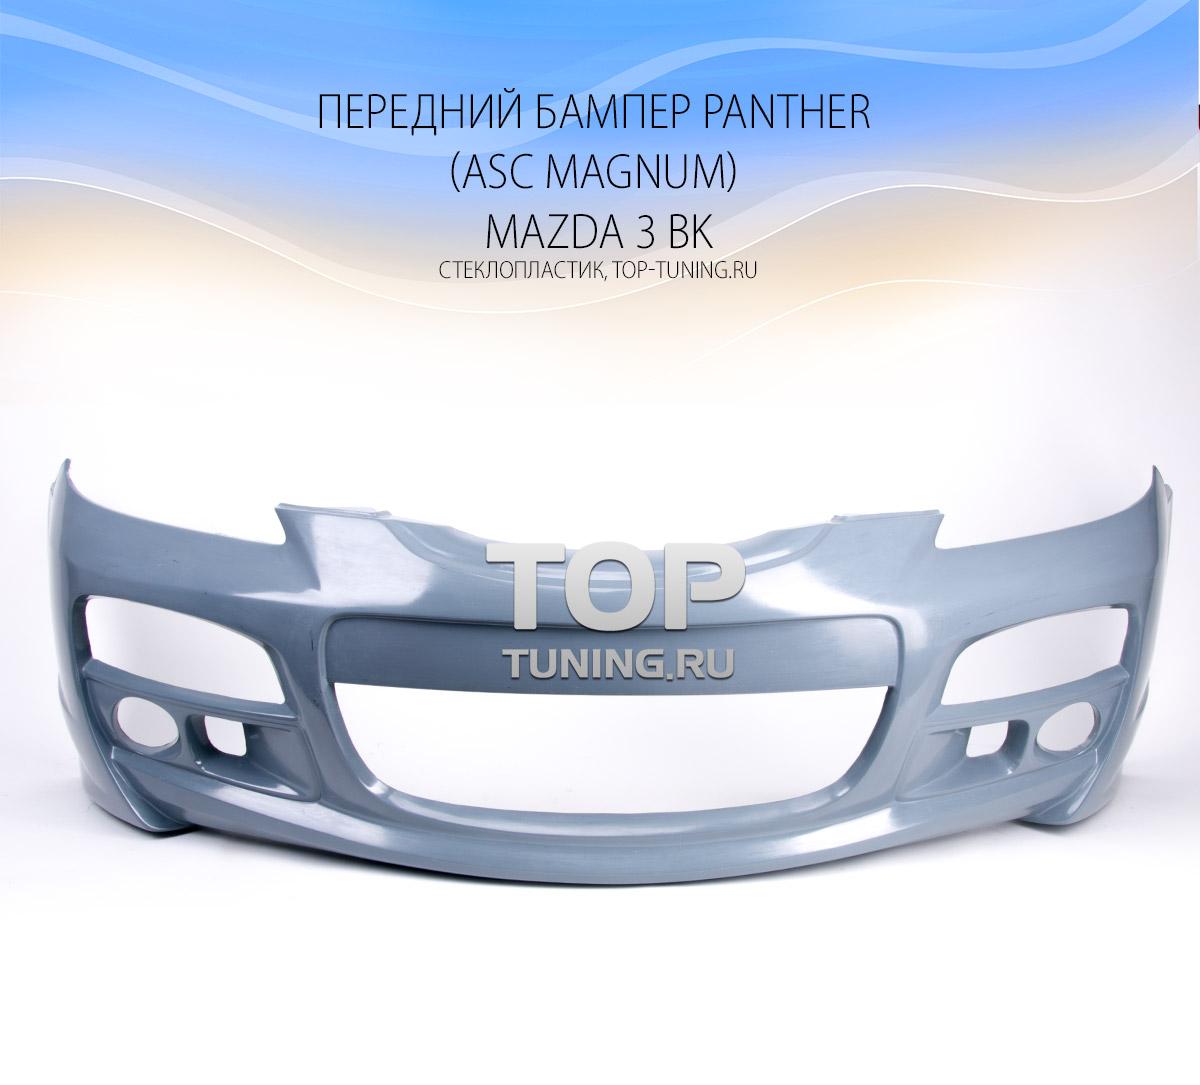 4947 Передний бампер - Обвес Panther (ASC Magnum) - Тюнинг Mazda 3 BK